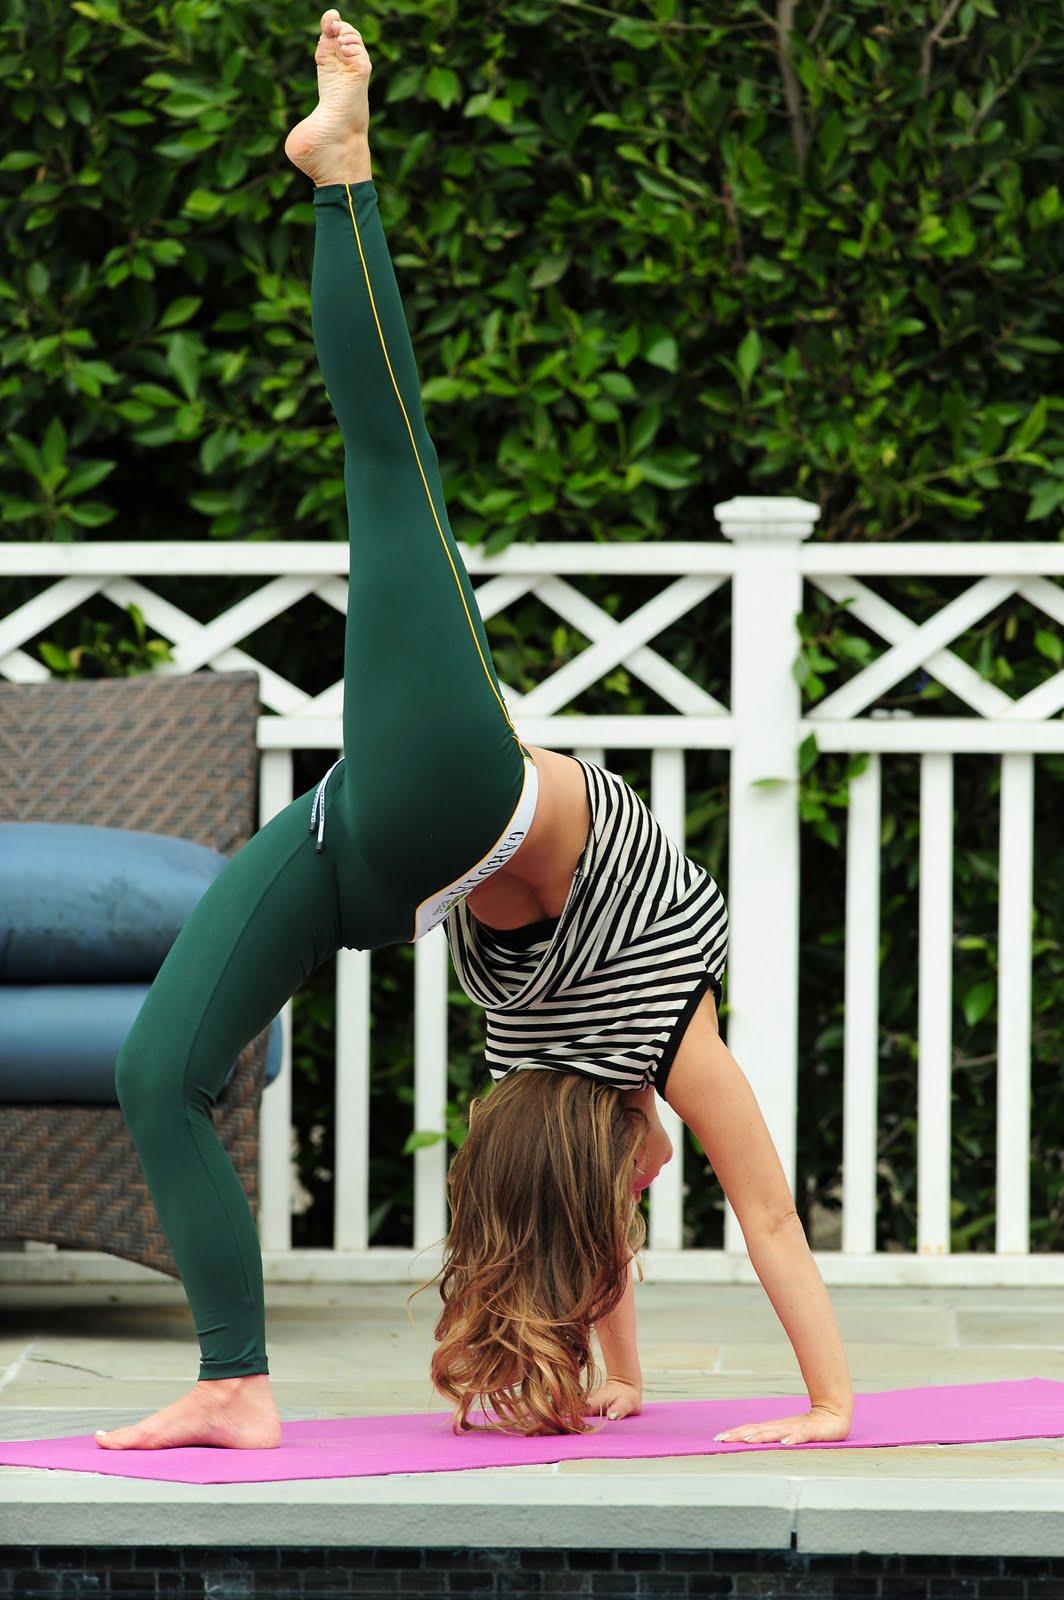 http://1.bp.blogspot.com/-FL390Pj_mSg/TW9HVMEvHRI/AAAAAAAAGUQ/ObgfhbC-JNU/s1600/celebskin_carmen_electra_leggings_yoga_candids_13.jpg